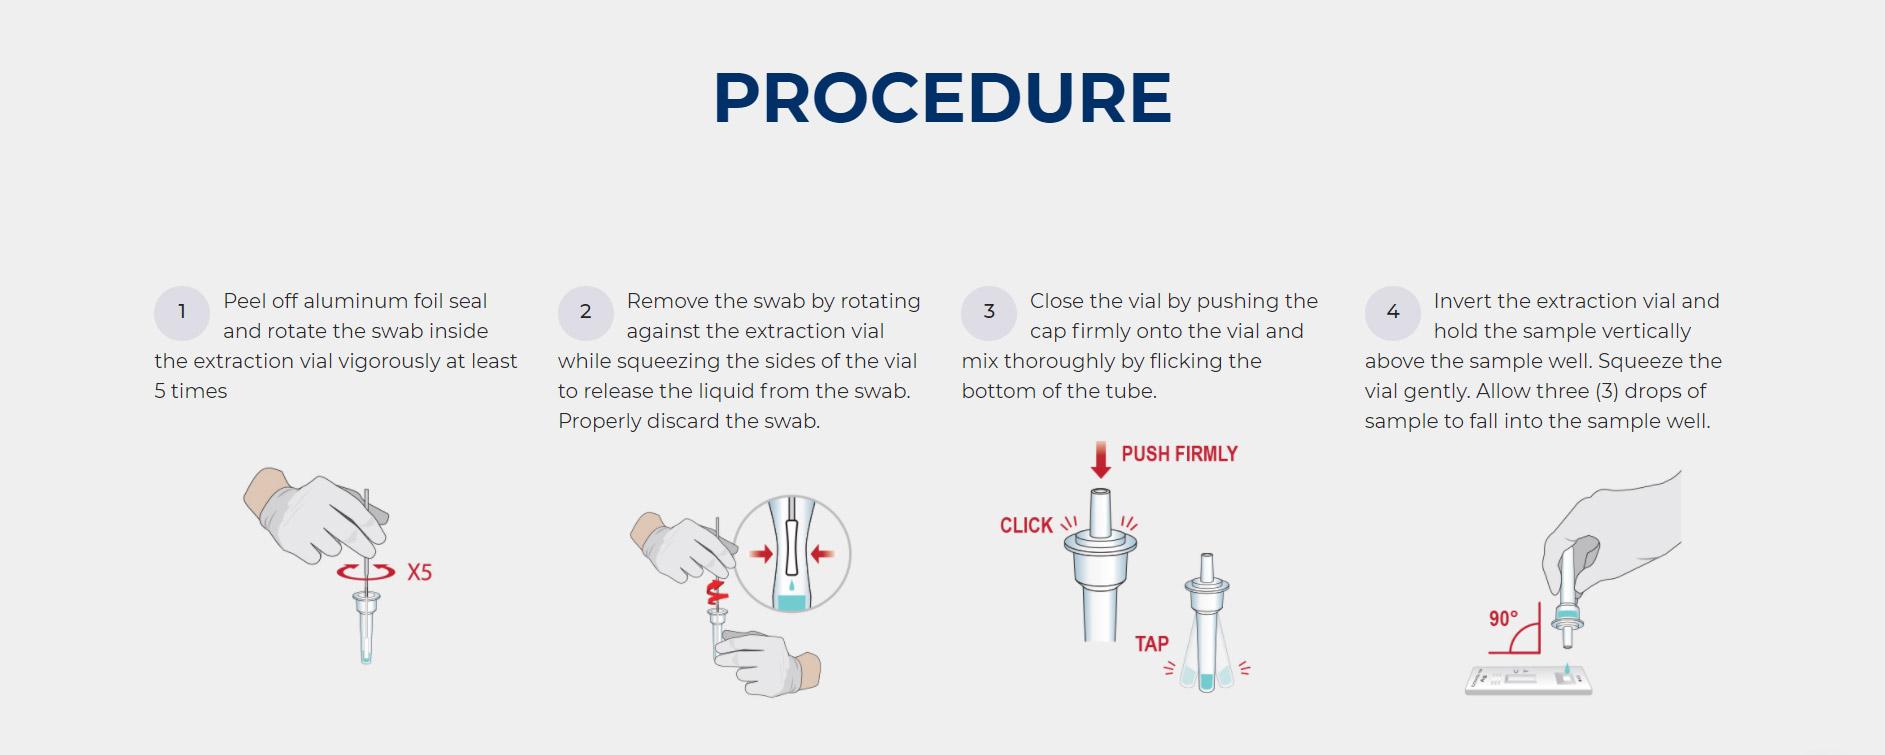 CareStart Covid-19 Antigen Test Procedure